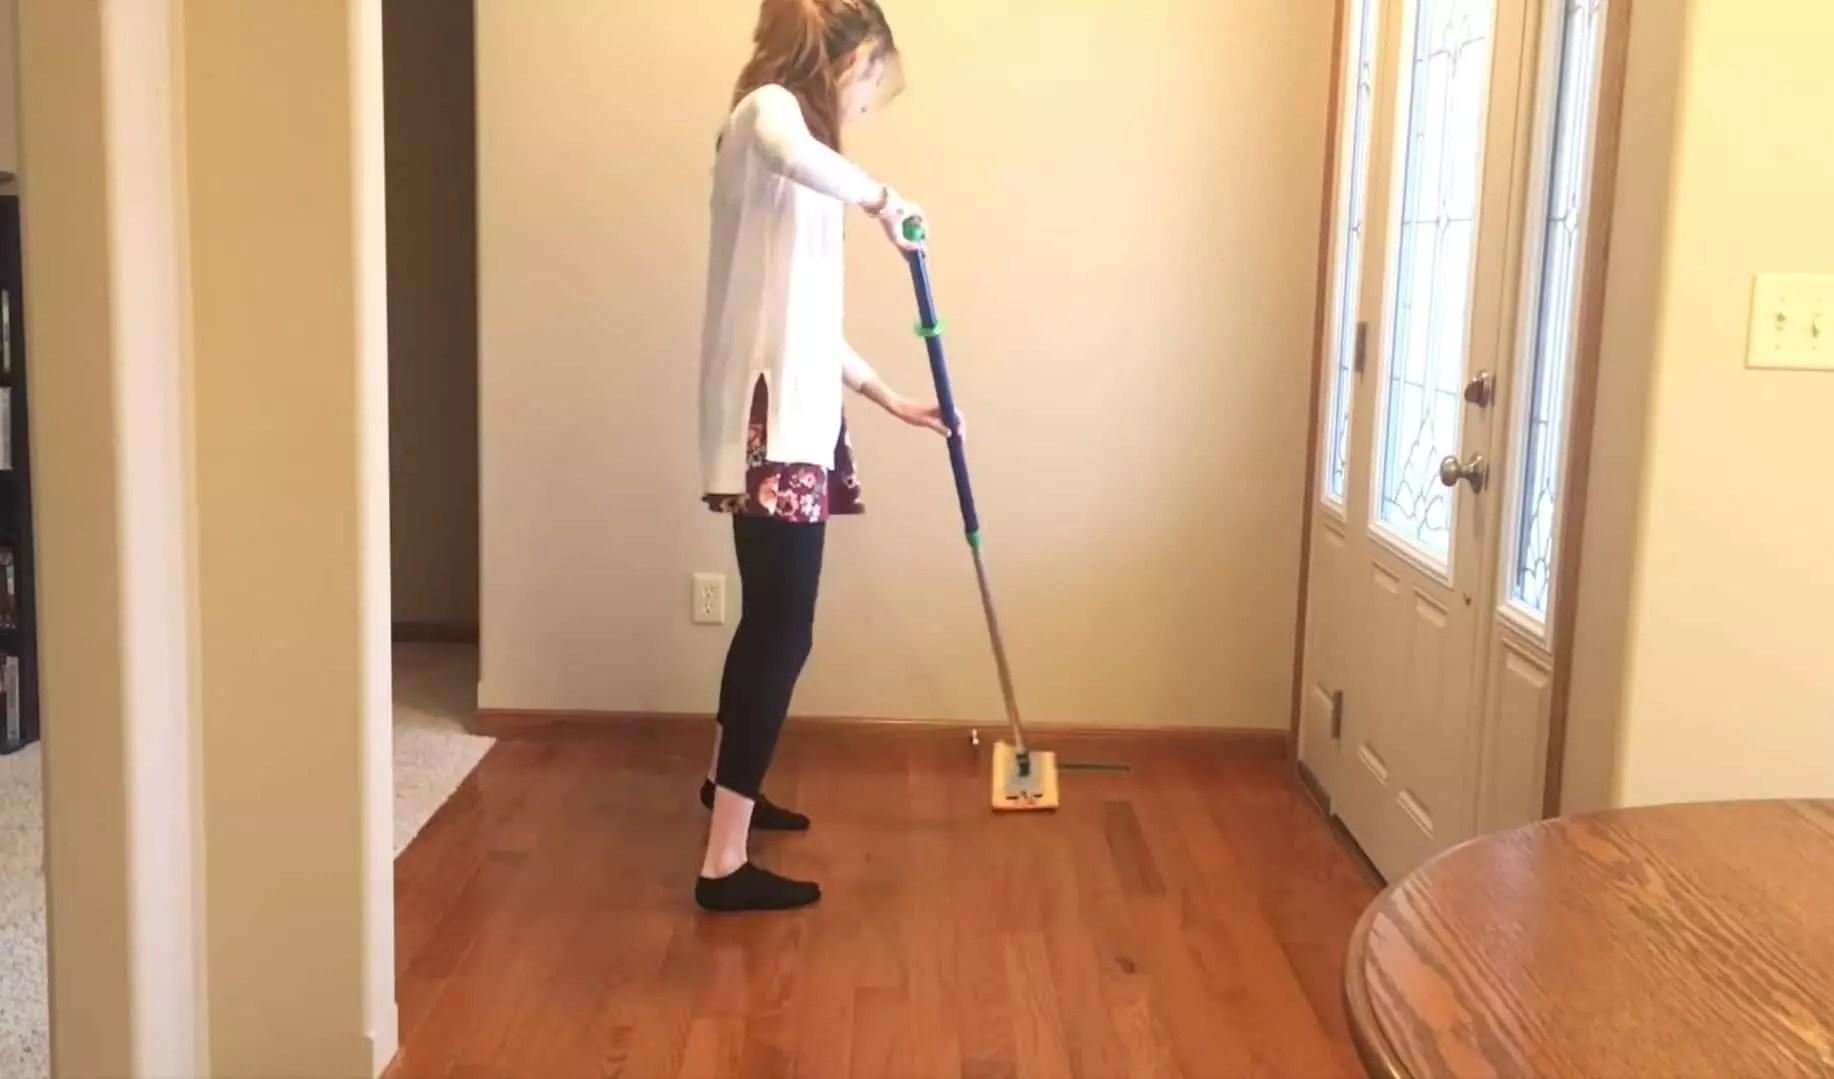 Dampened mops work great on vinyl and hardwood floors